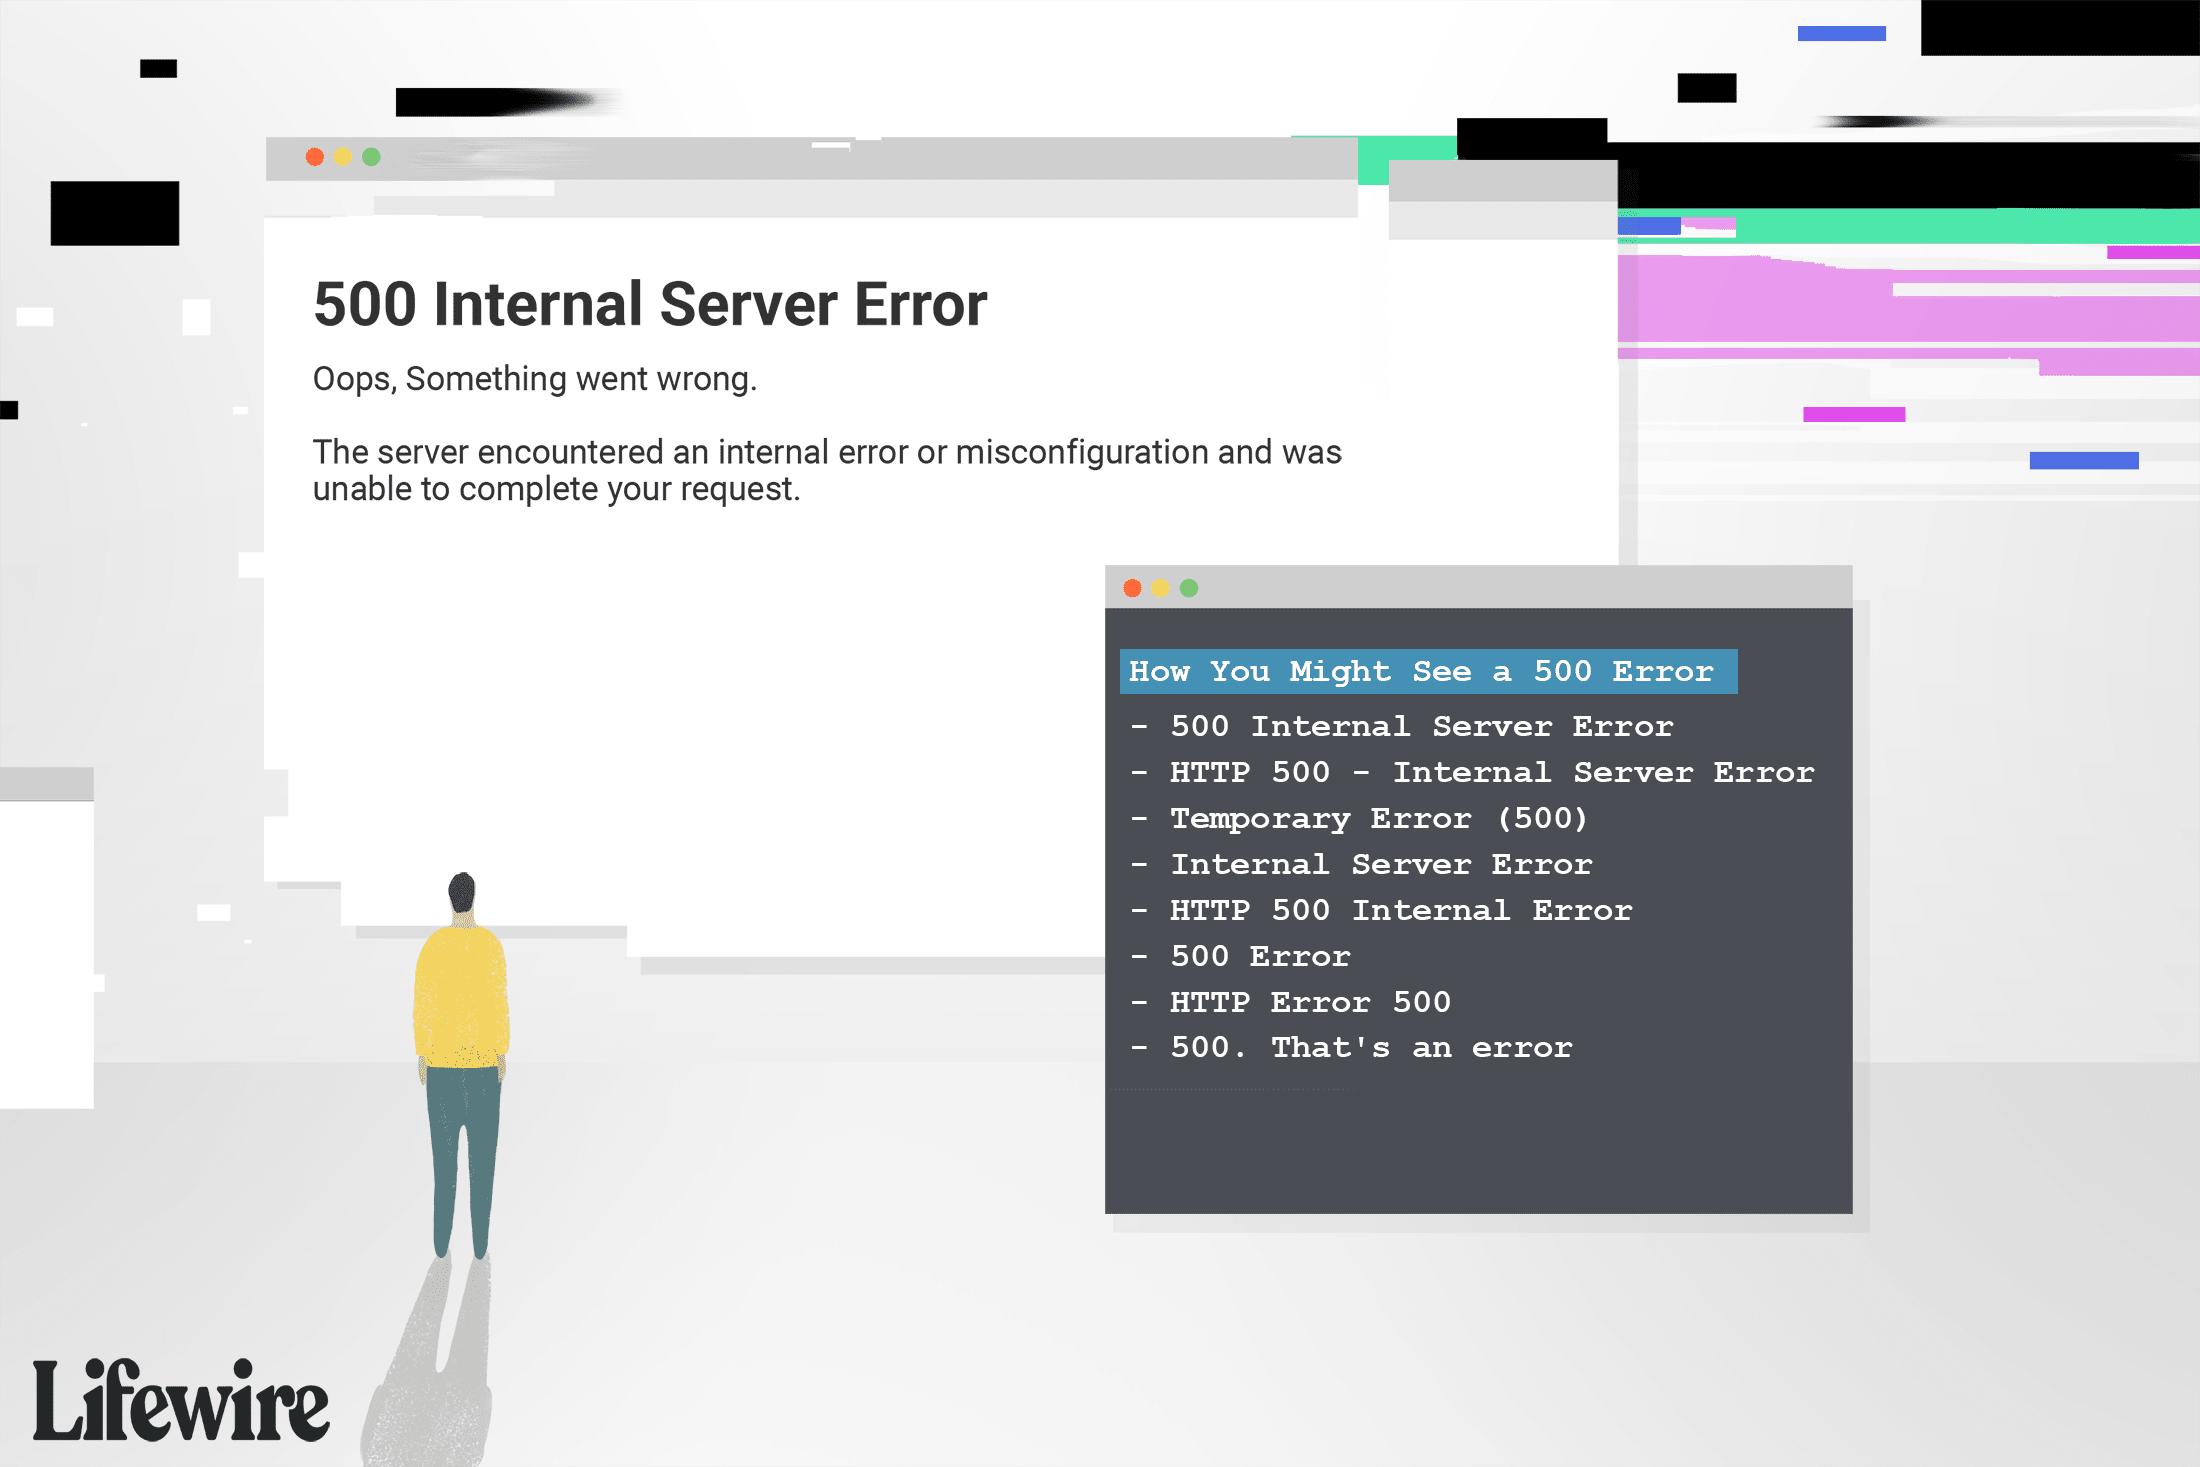 An illustration of a man looking at a 500 Internal Server Error.